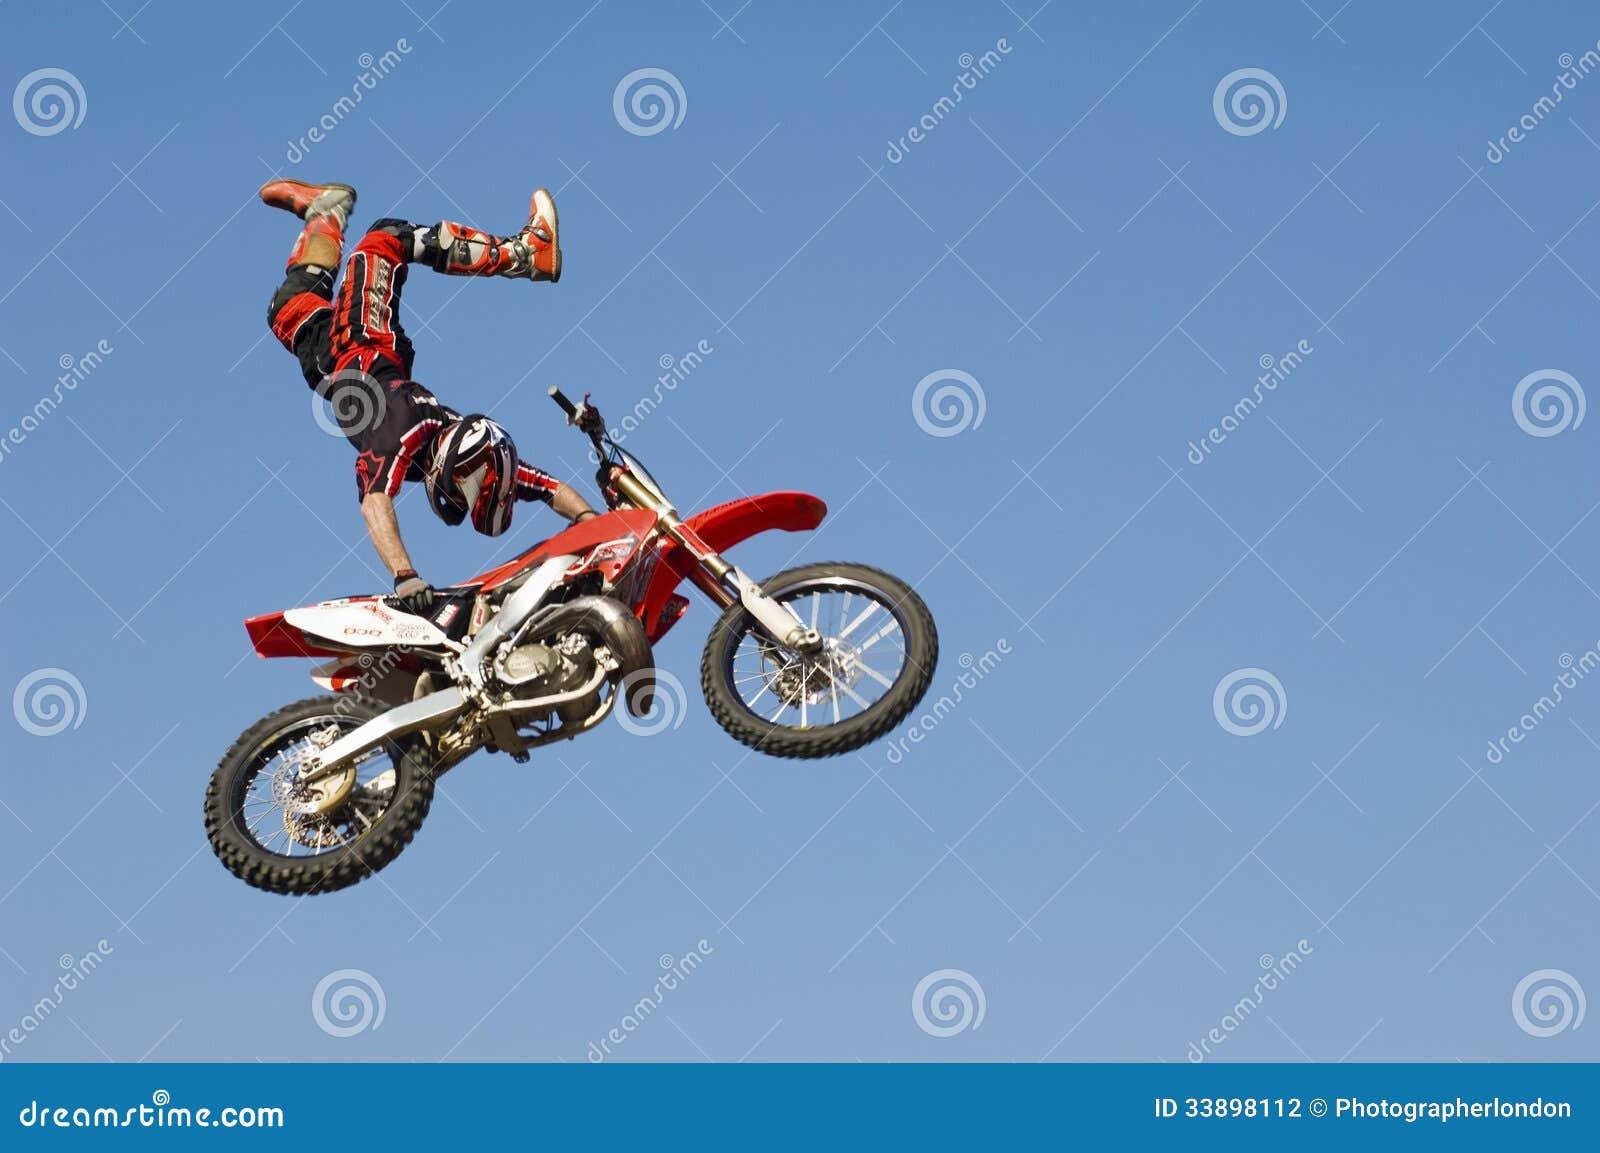 Motocross Racer Performing Stunt With Motorcycle In Midair Against Sky